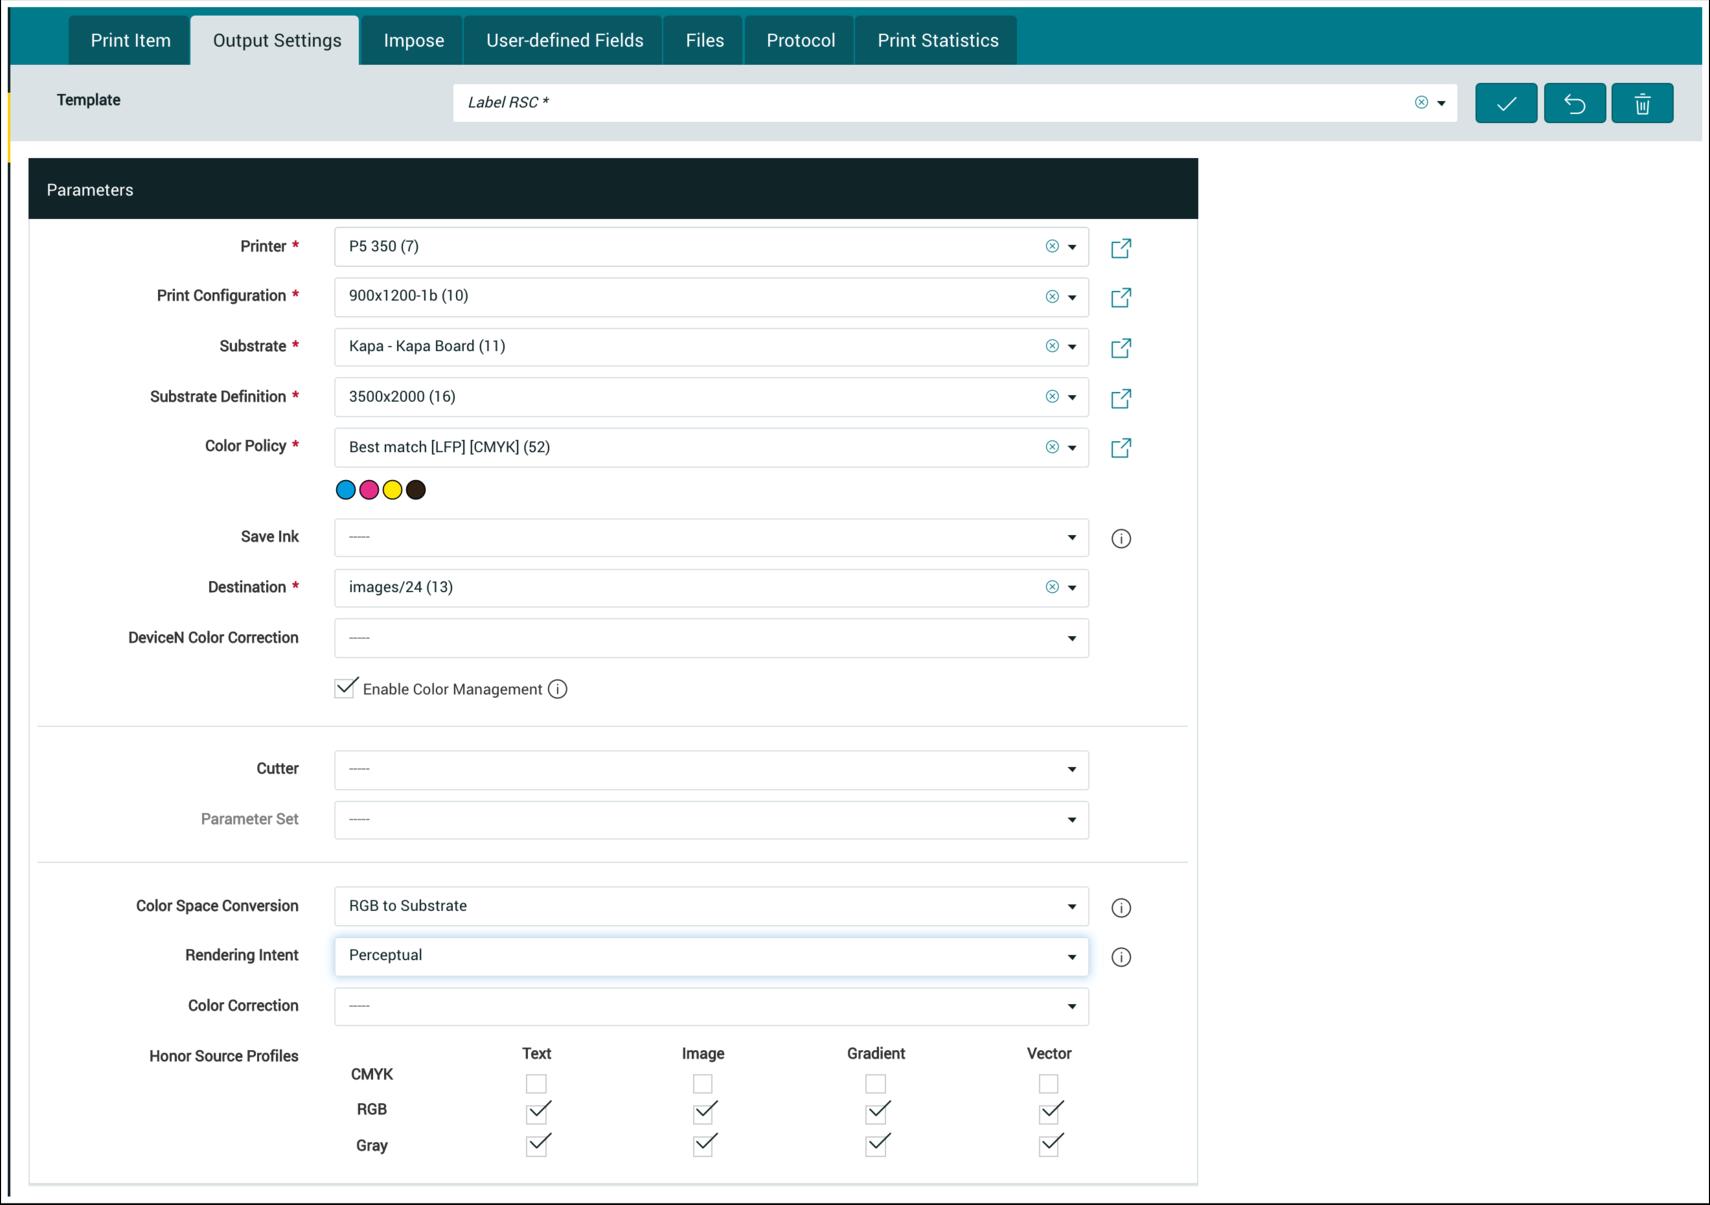 PMS WebGui :: Output Settings